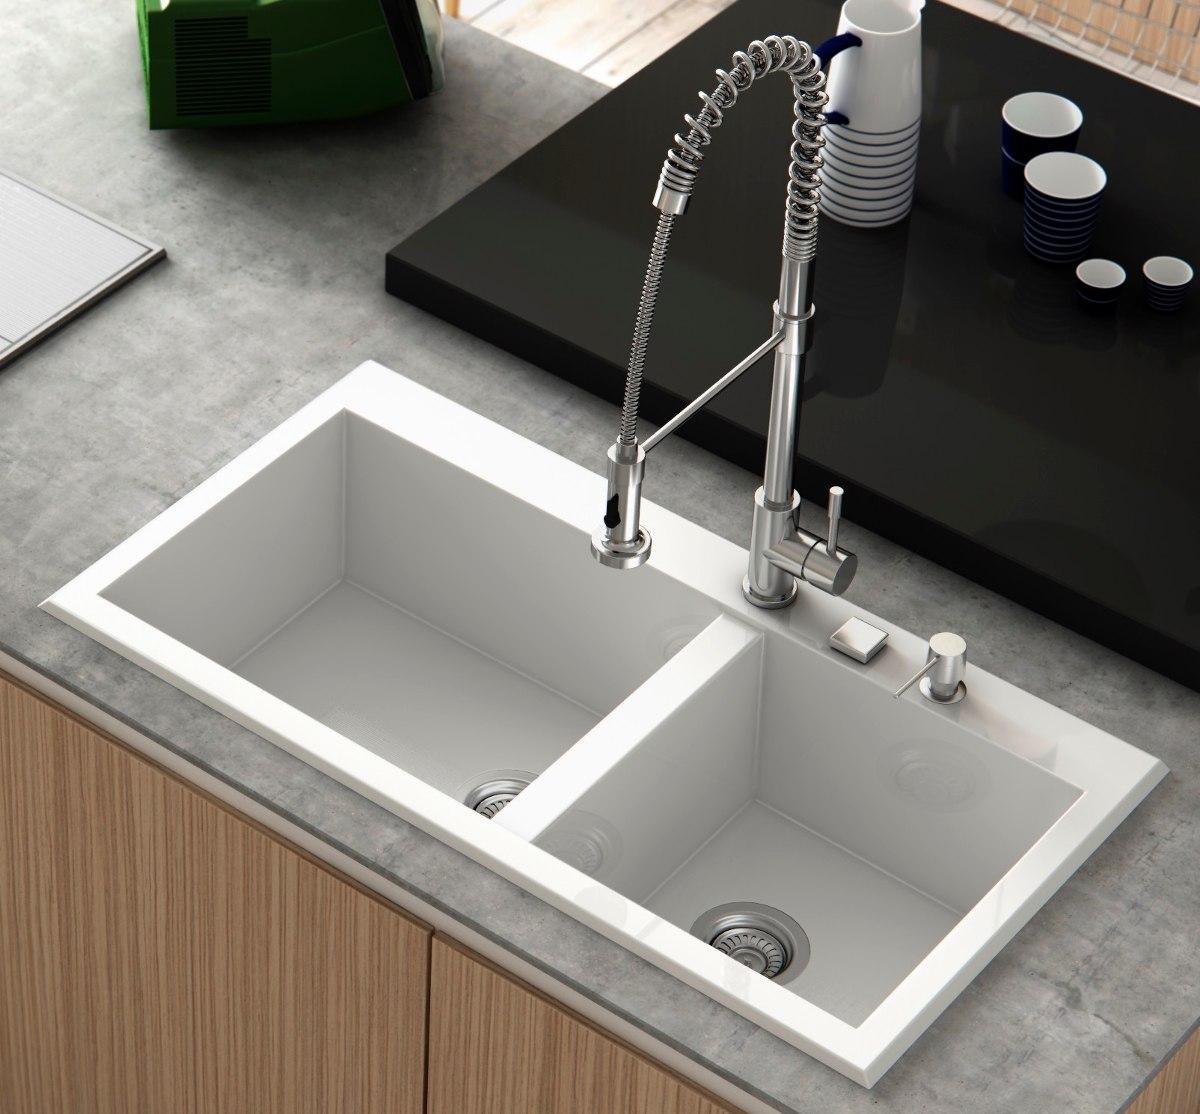 Fregadero lavaplatos mineral antibacterial poalgi blanco - Griferia cocina blanco ...